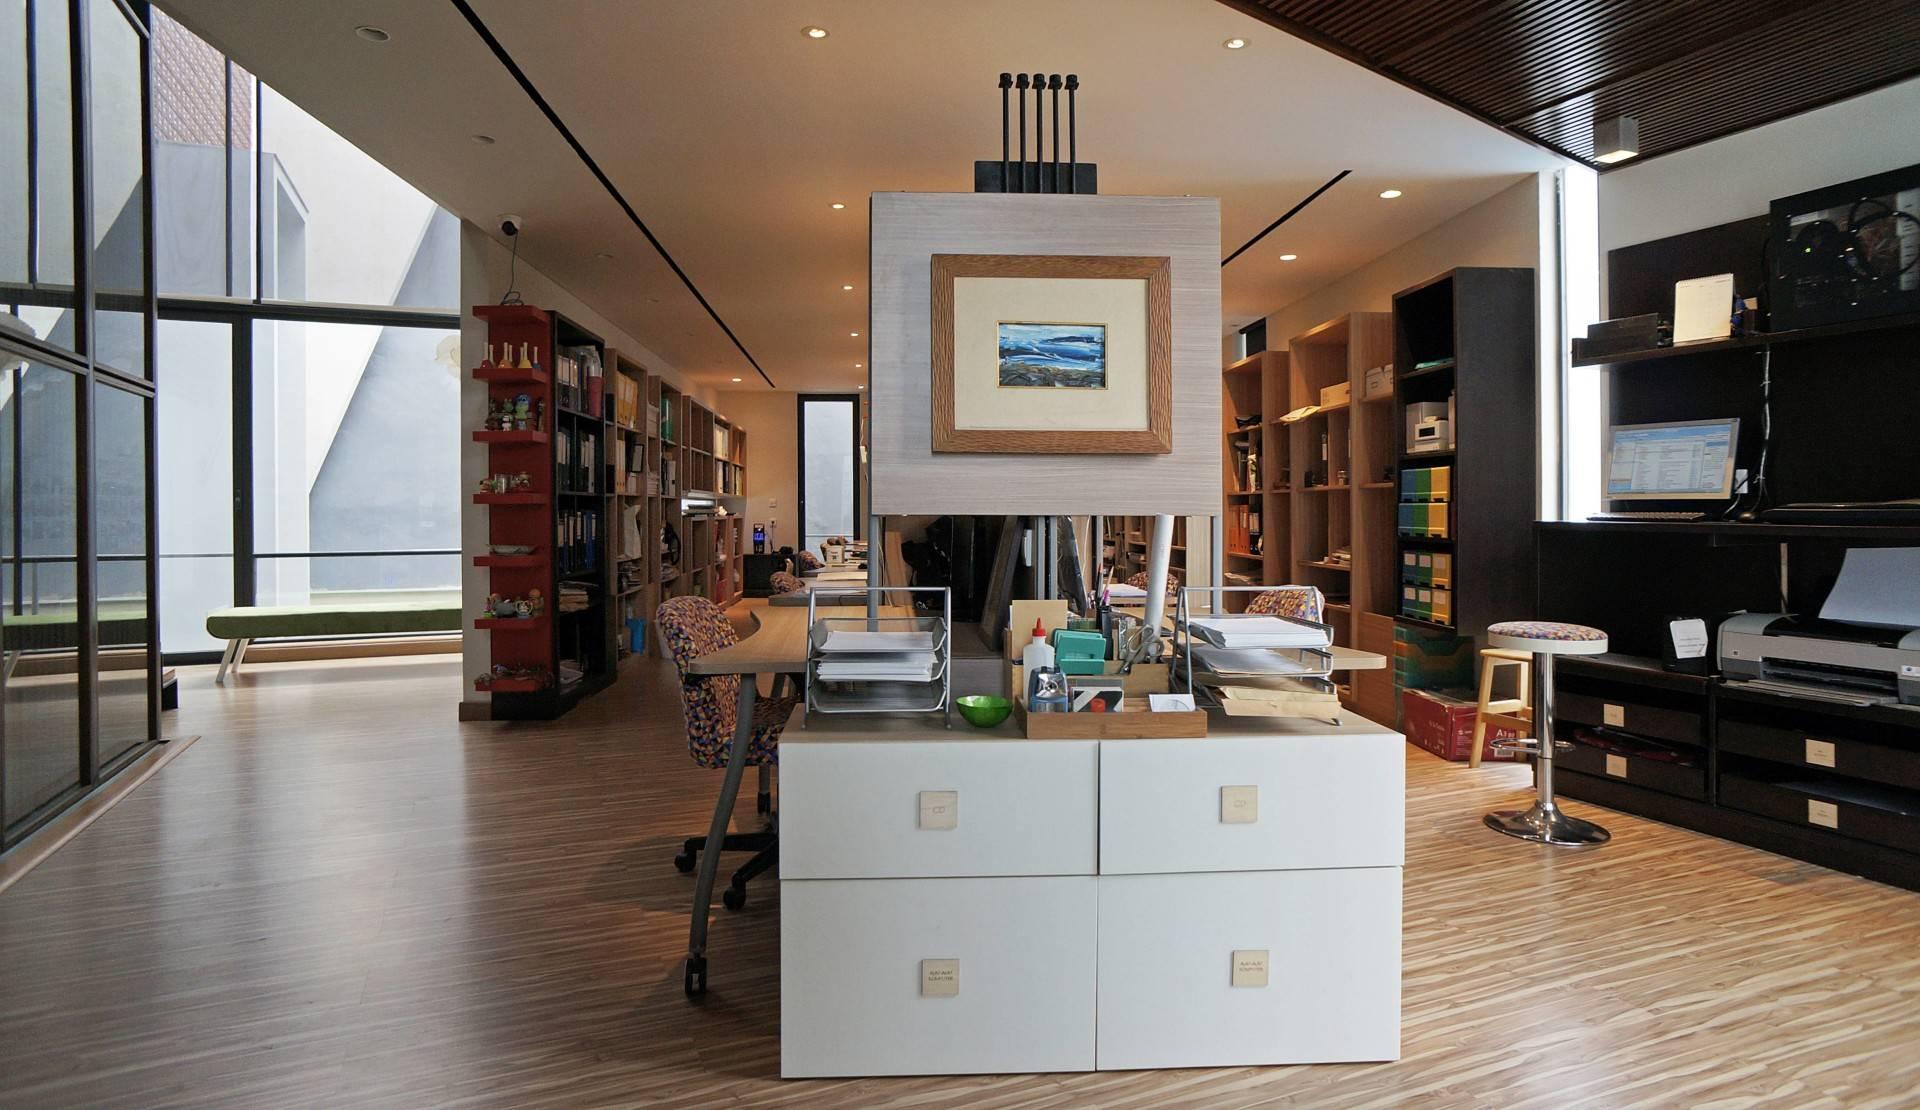 Sonny Sutanto Architects Sonny Sutanto Architects New Office Sunter, North Jakarta, Indonesia Sunter, North Jakarta, Indonesia Architects Working Area   2110